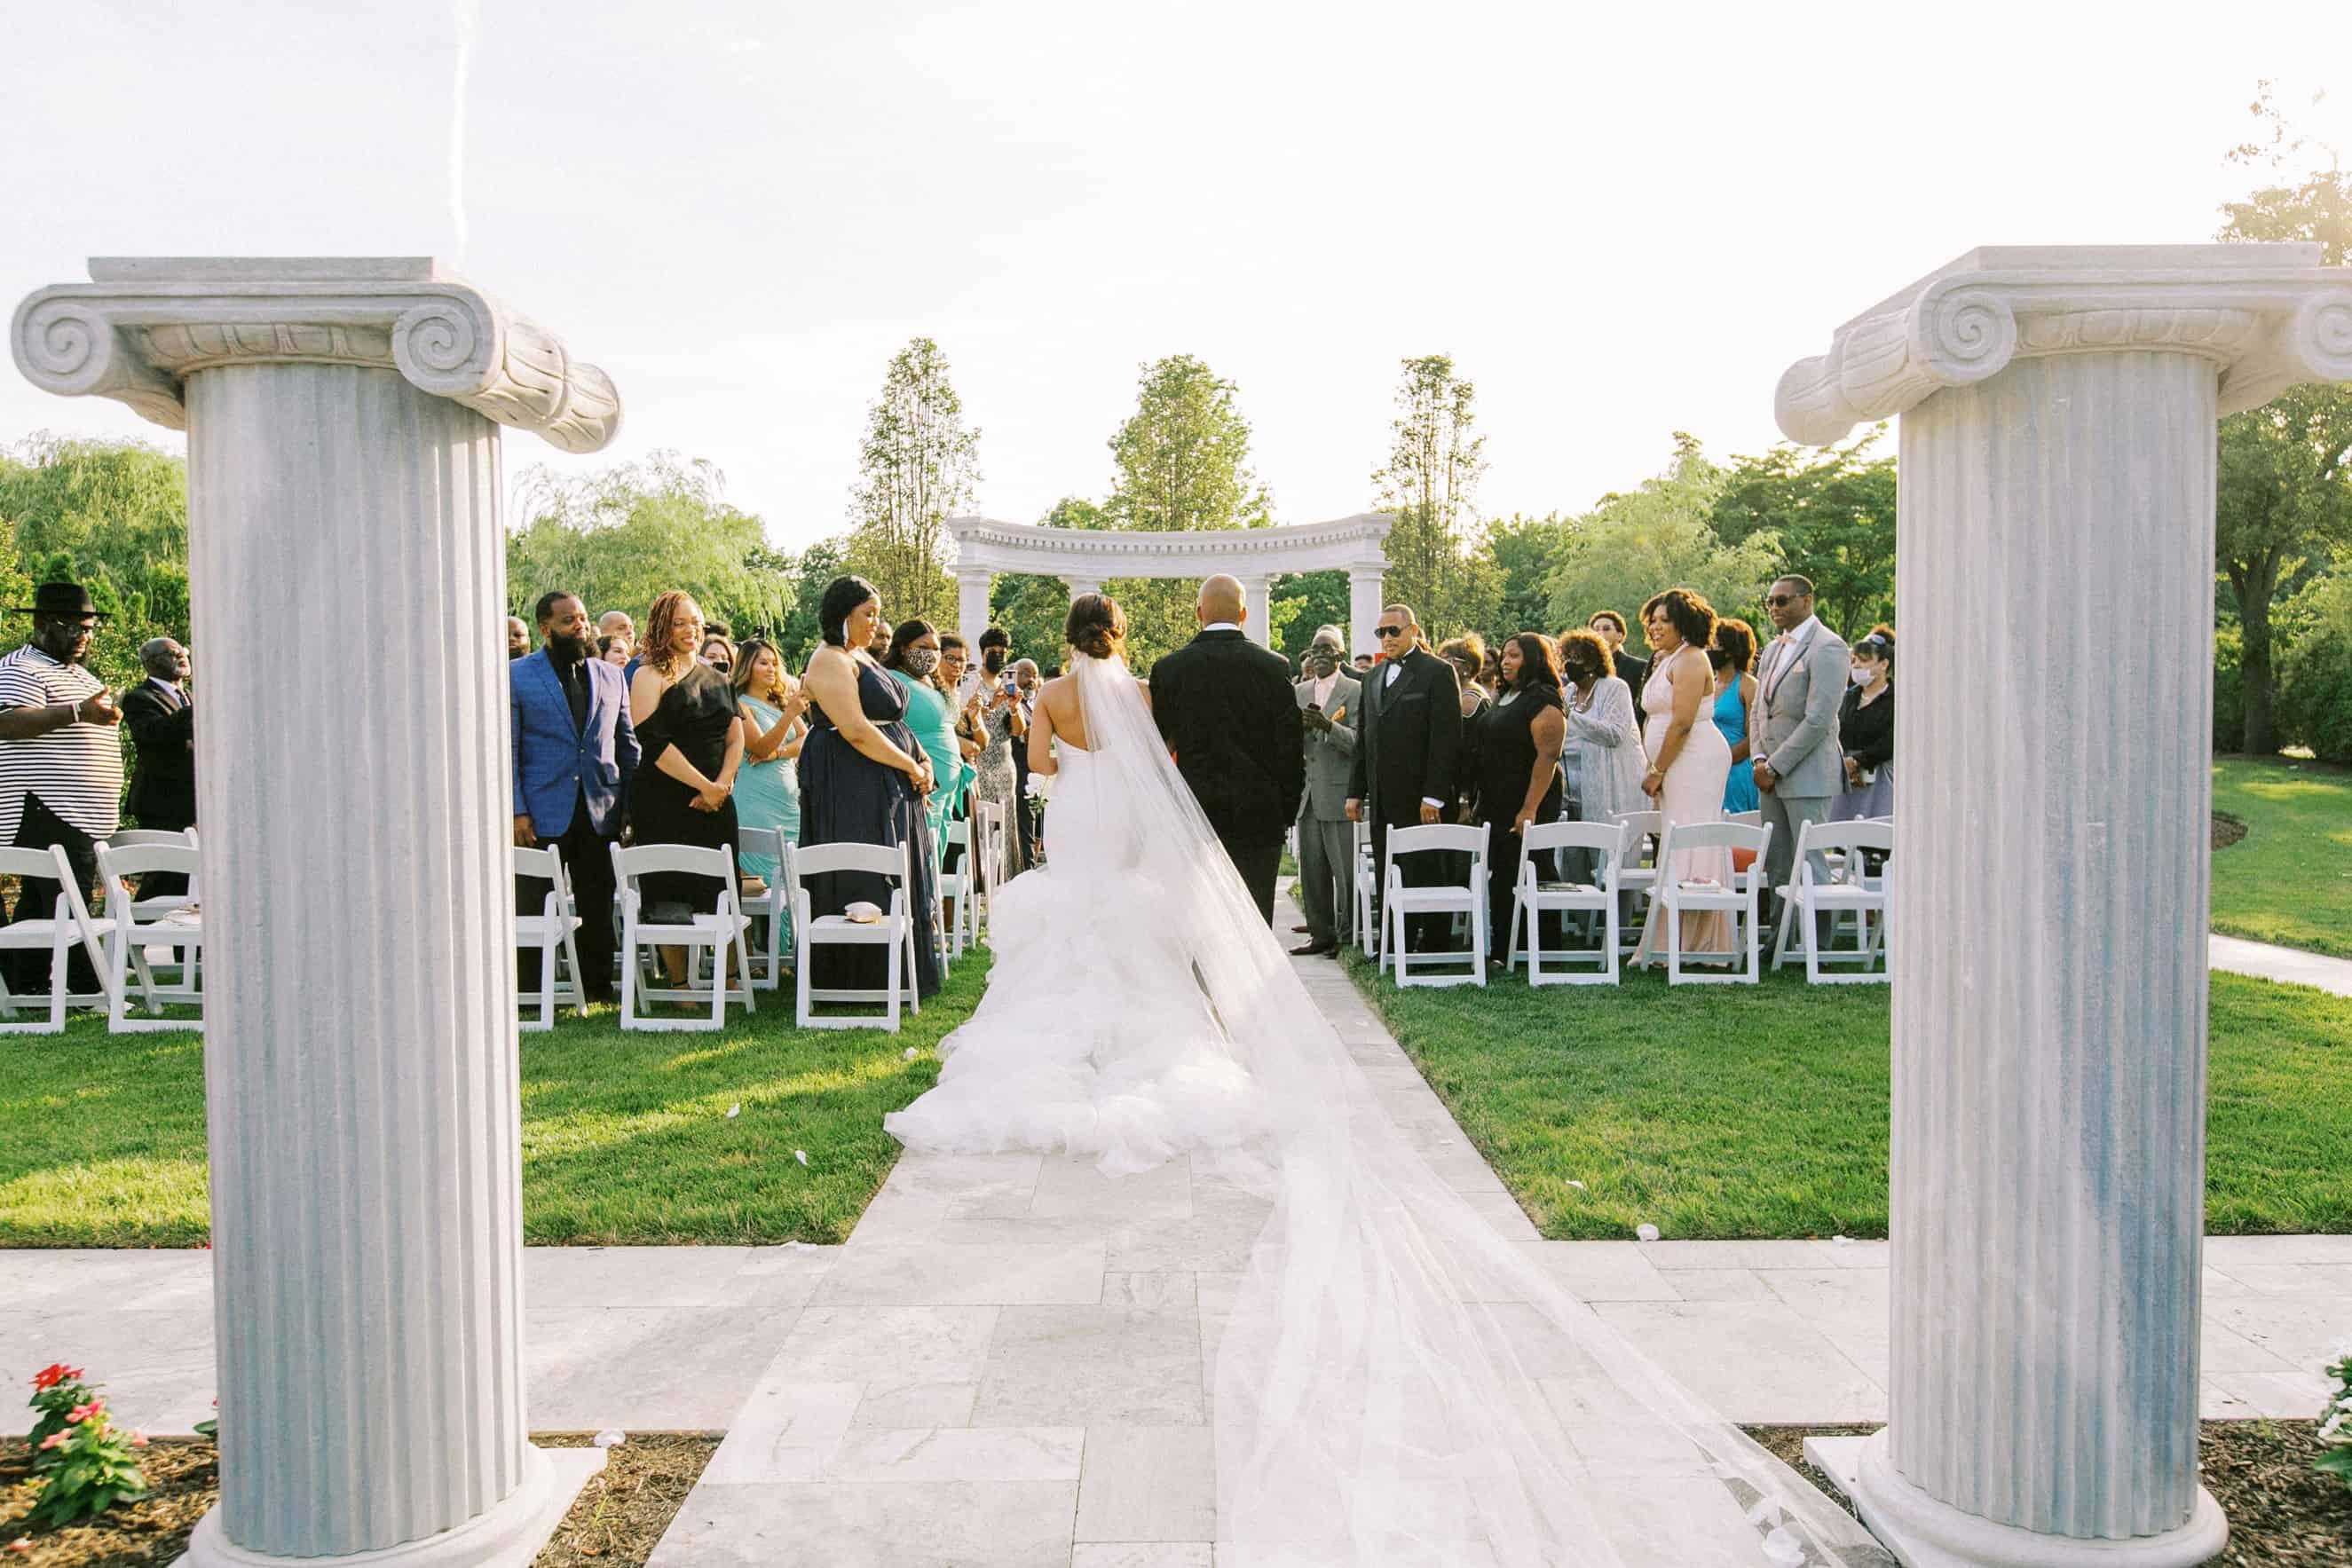 Outdoor Wedding Ceremony New Jersey